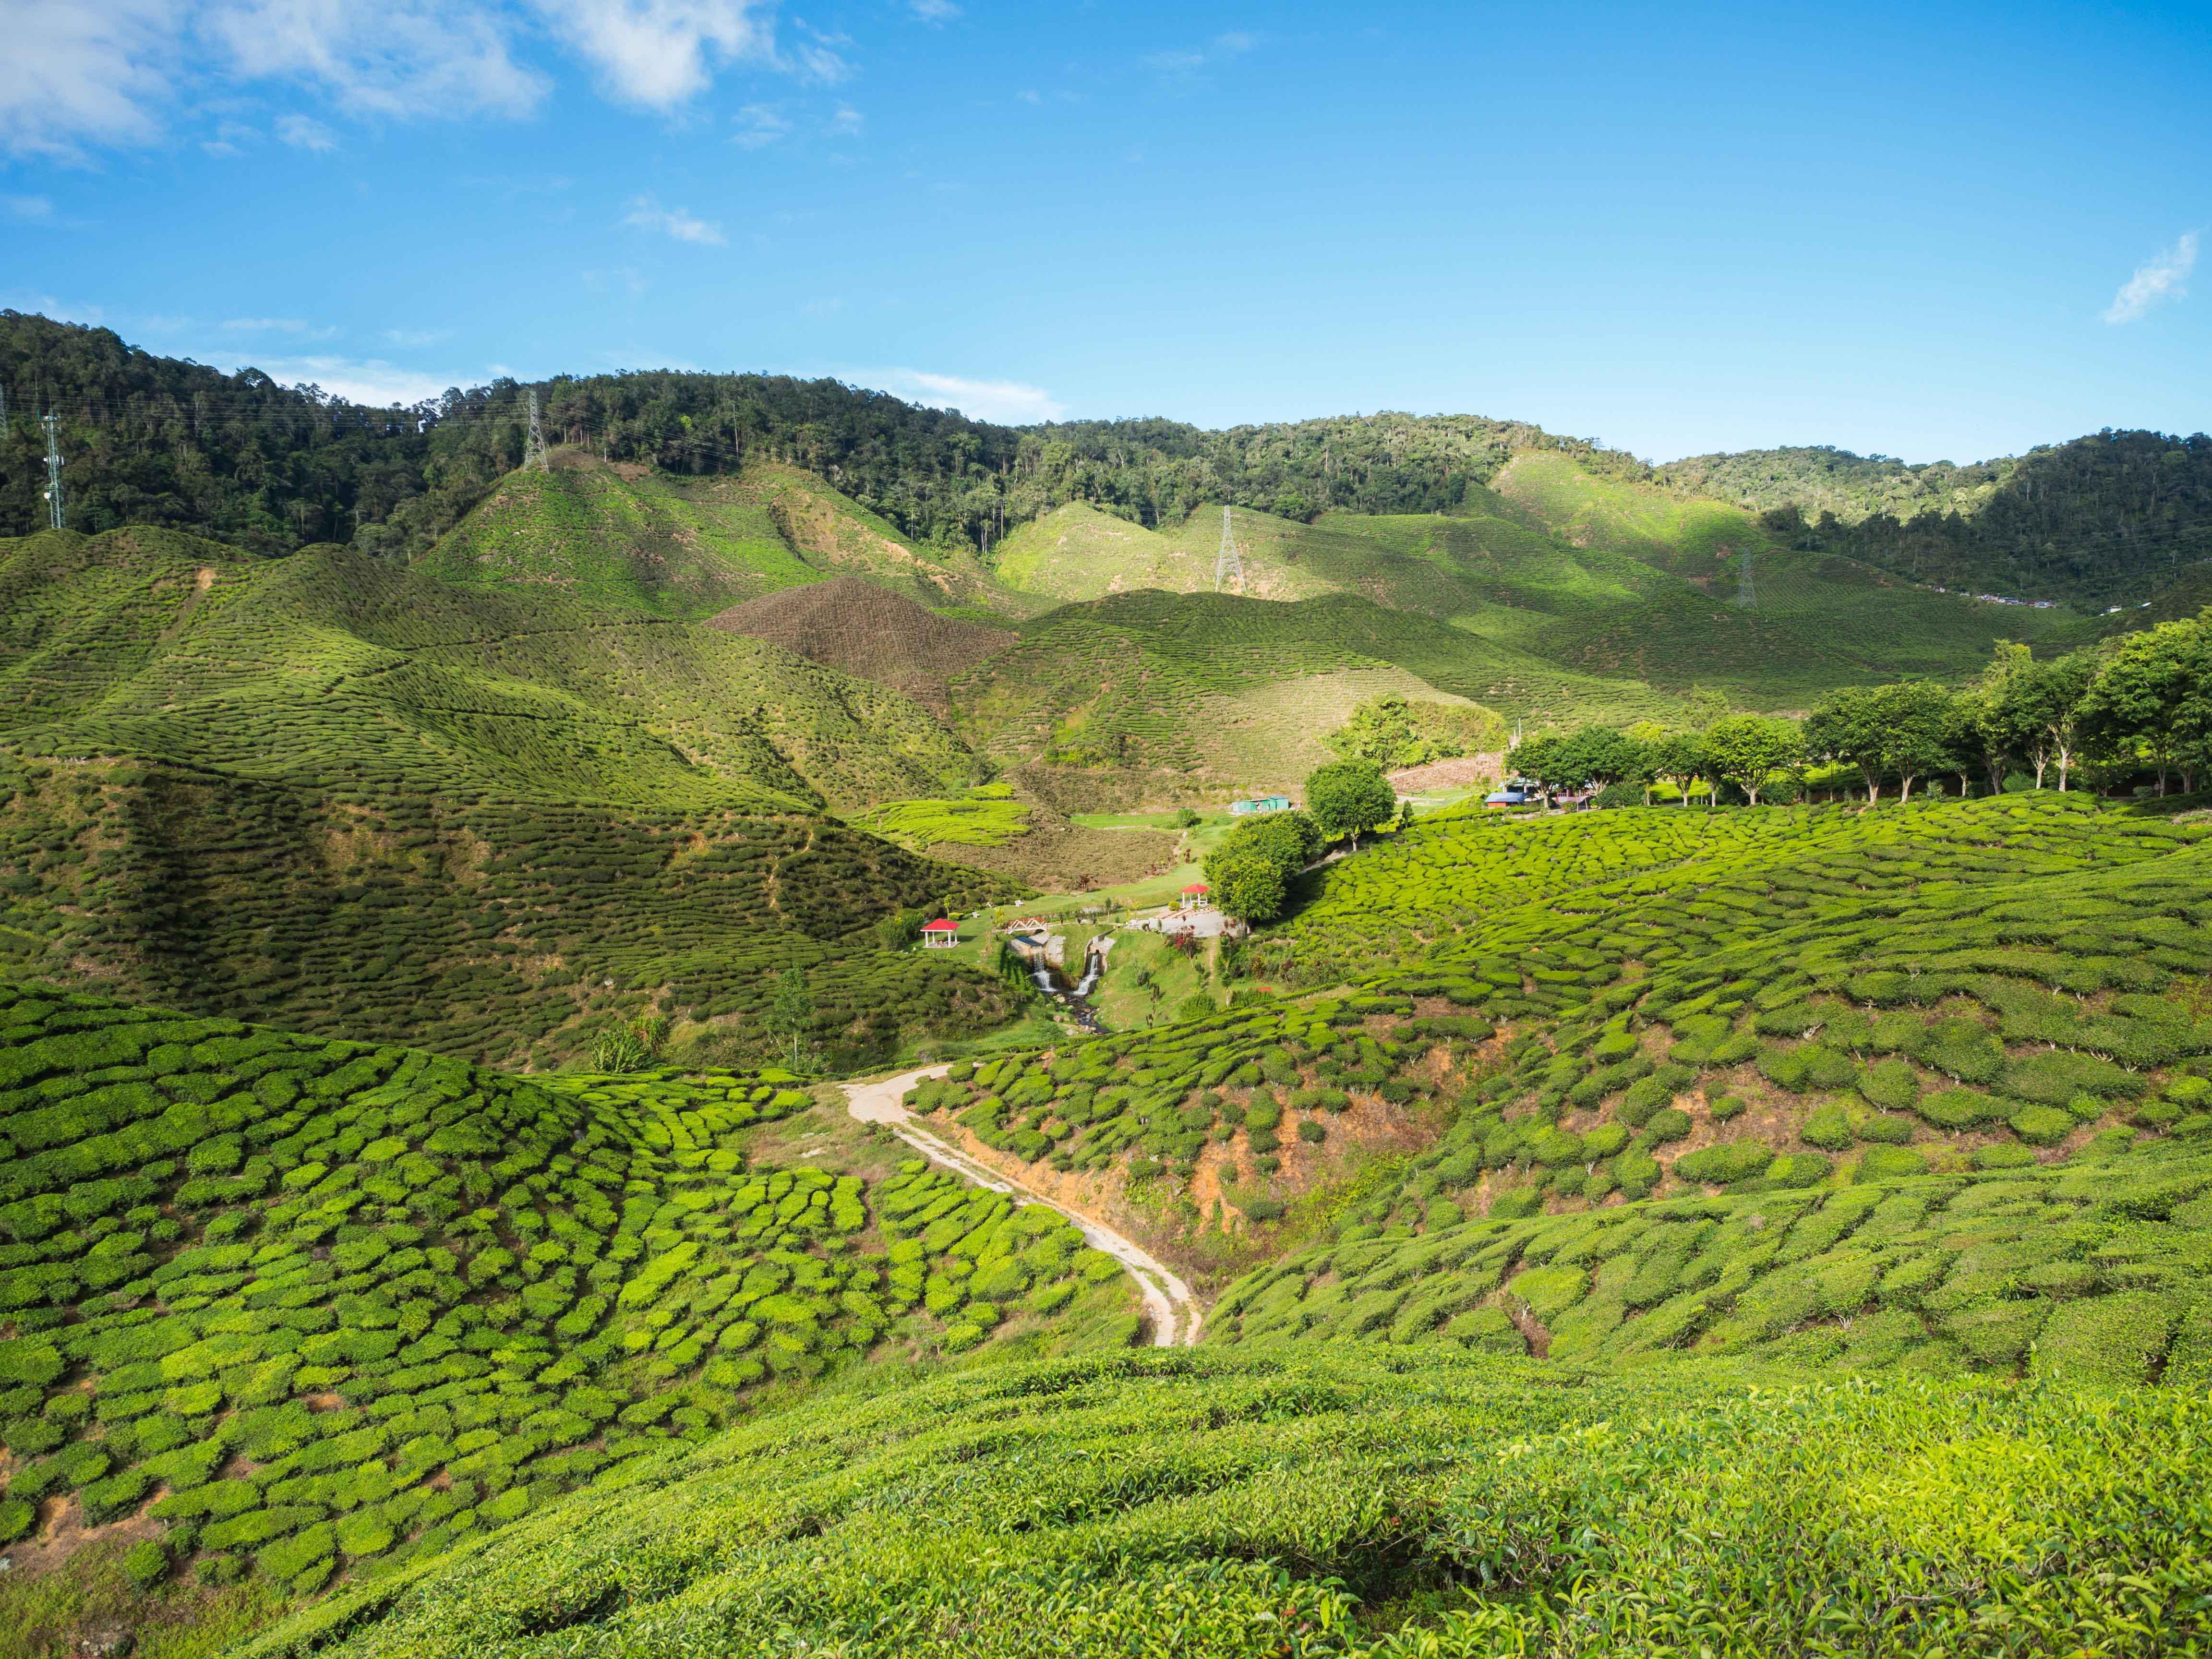 Cameron Highland's Tea plantation